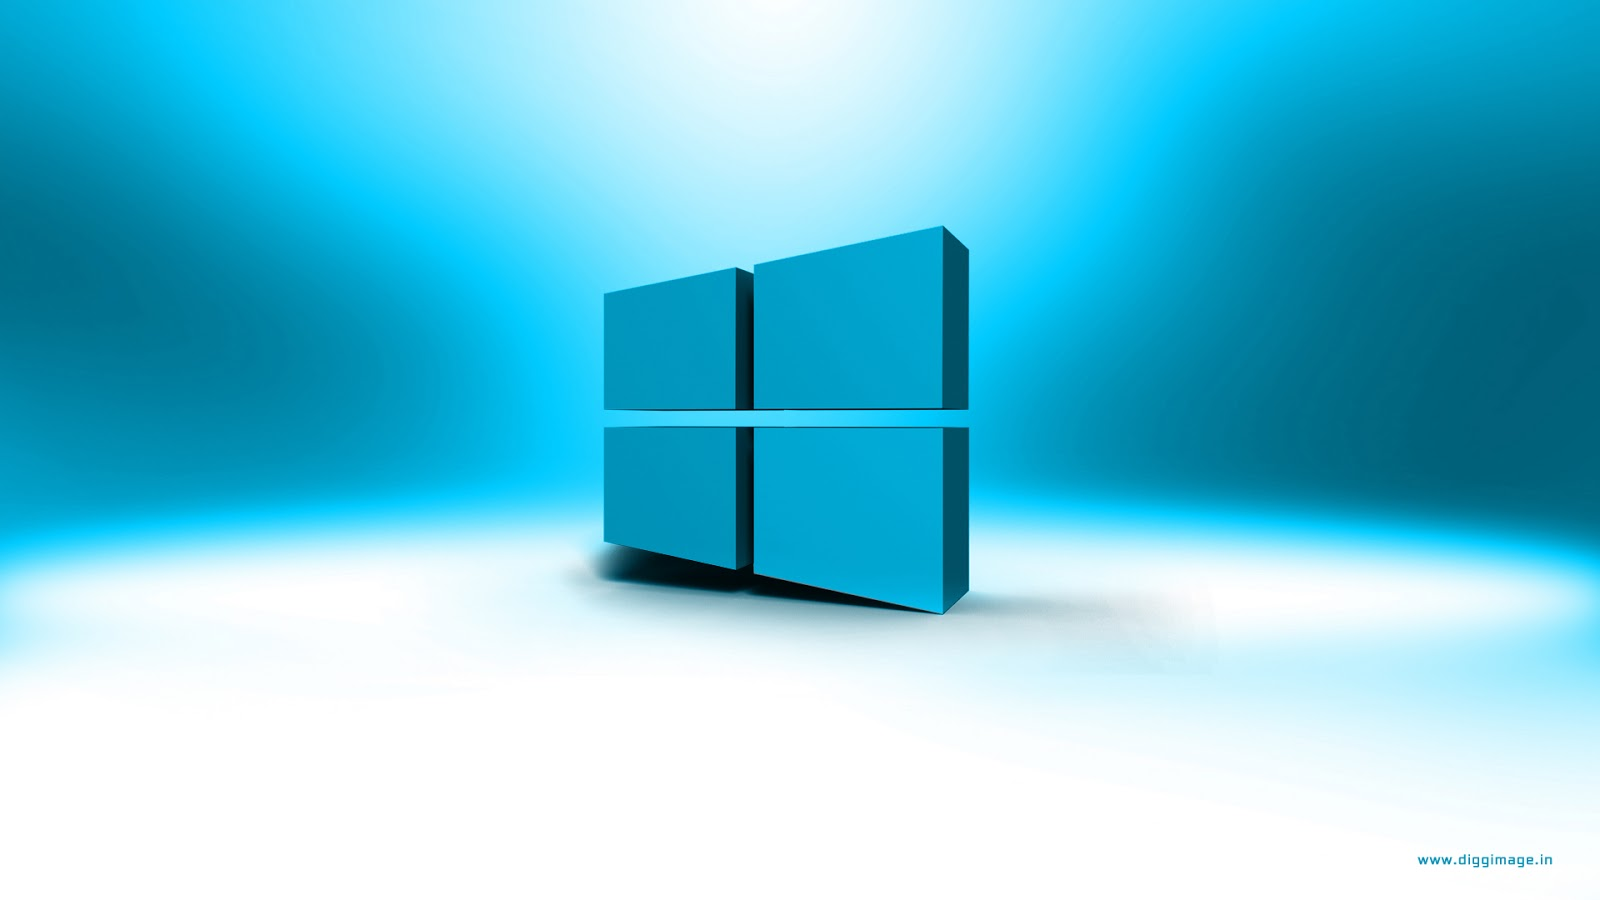 windows 8 wallpaper hd windows 8 wallpaper hd 1366x768 1250 hd 1600x900